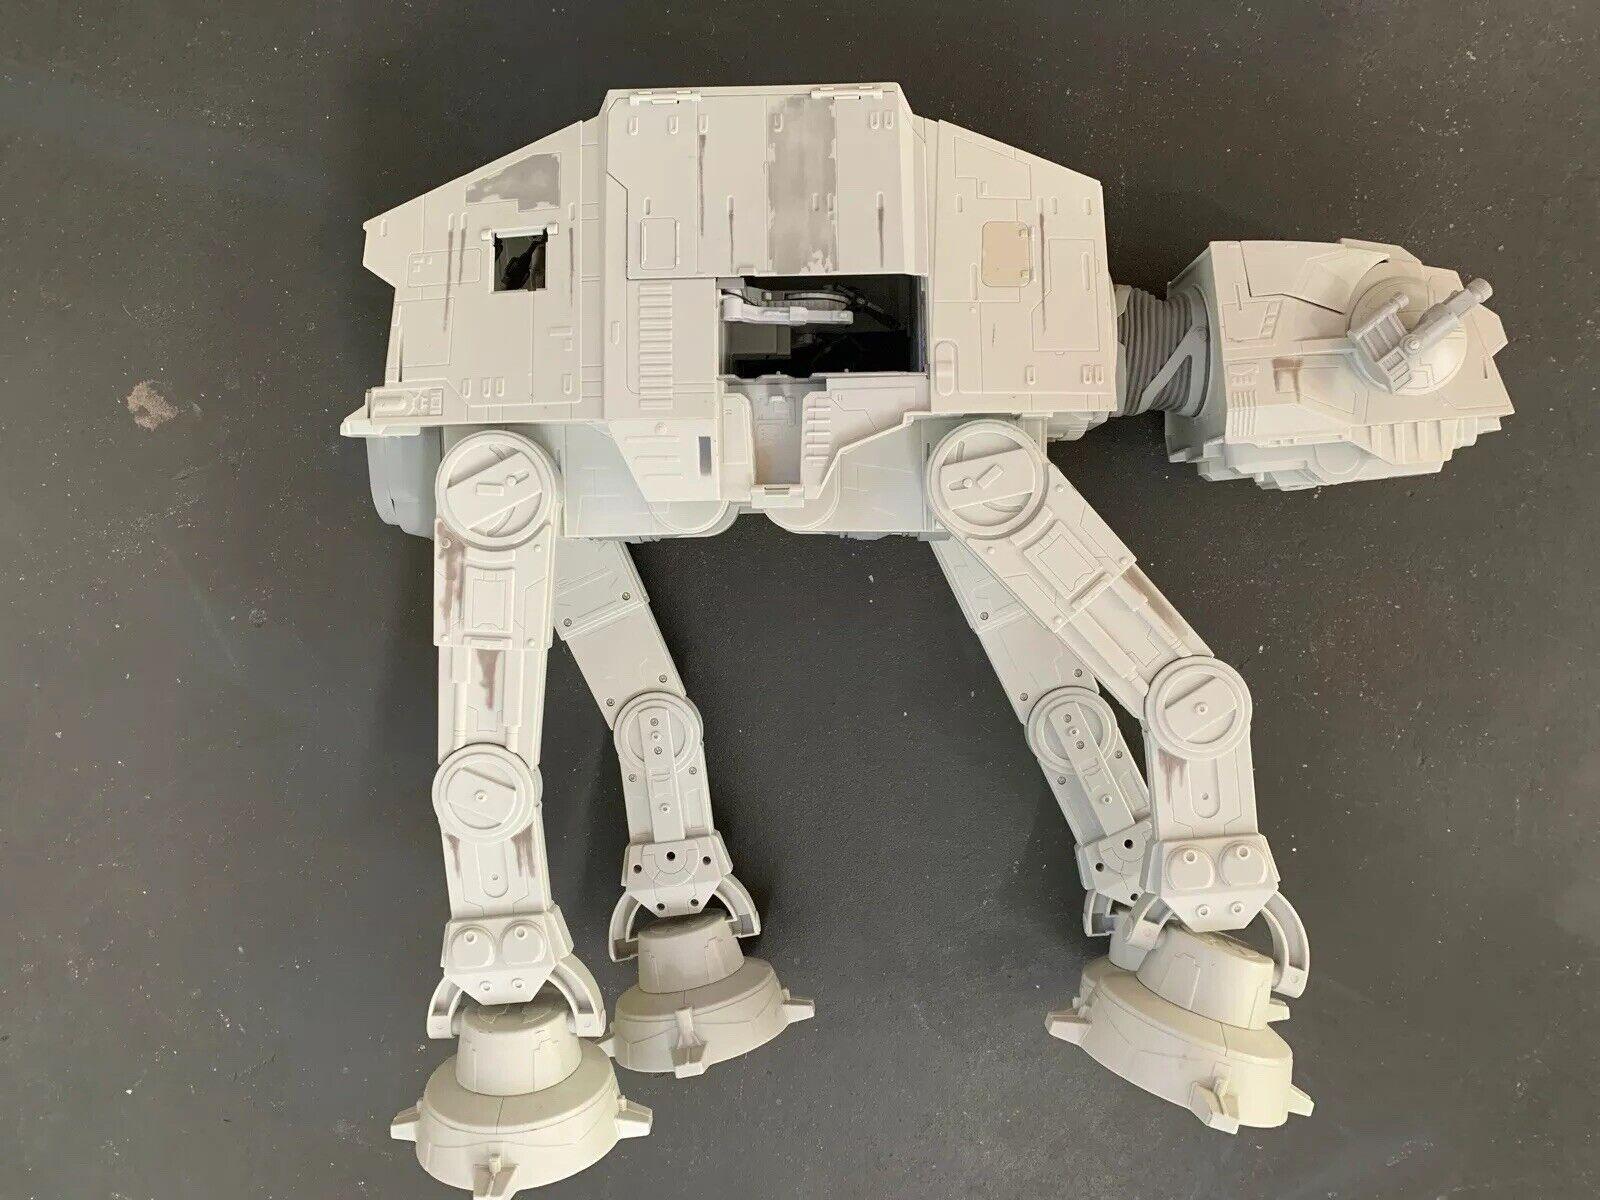 Star Wars Hasbro Legacy AT-AT Imperial Walker 2010 Chin Gun--1xReplacement Part